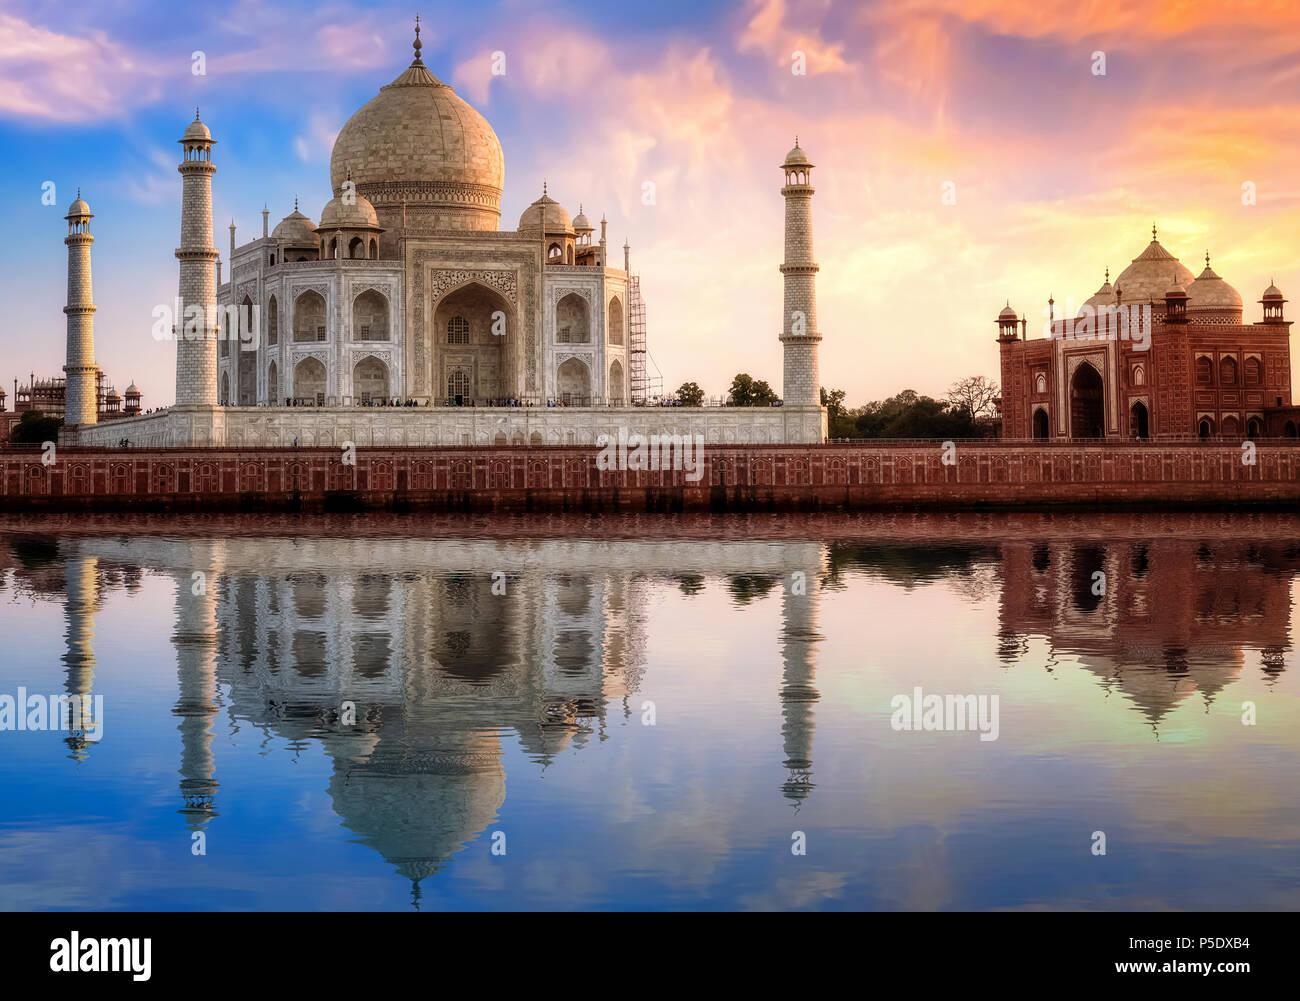 Taj Mahal in Agra Indien mit East Gate bei Sonnenuntergang mit Moody Himmel. Stockbild